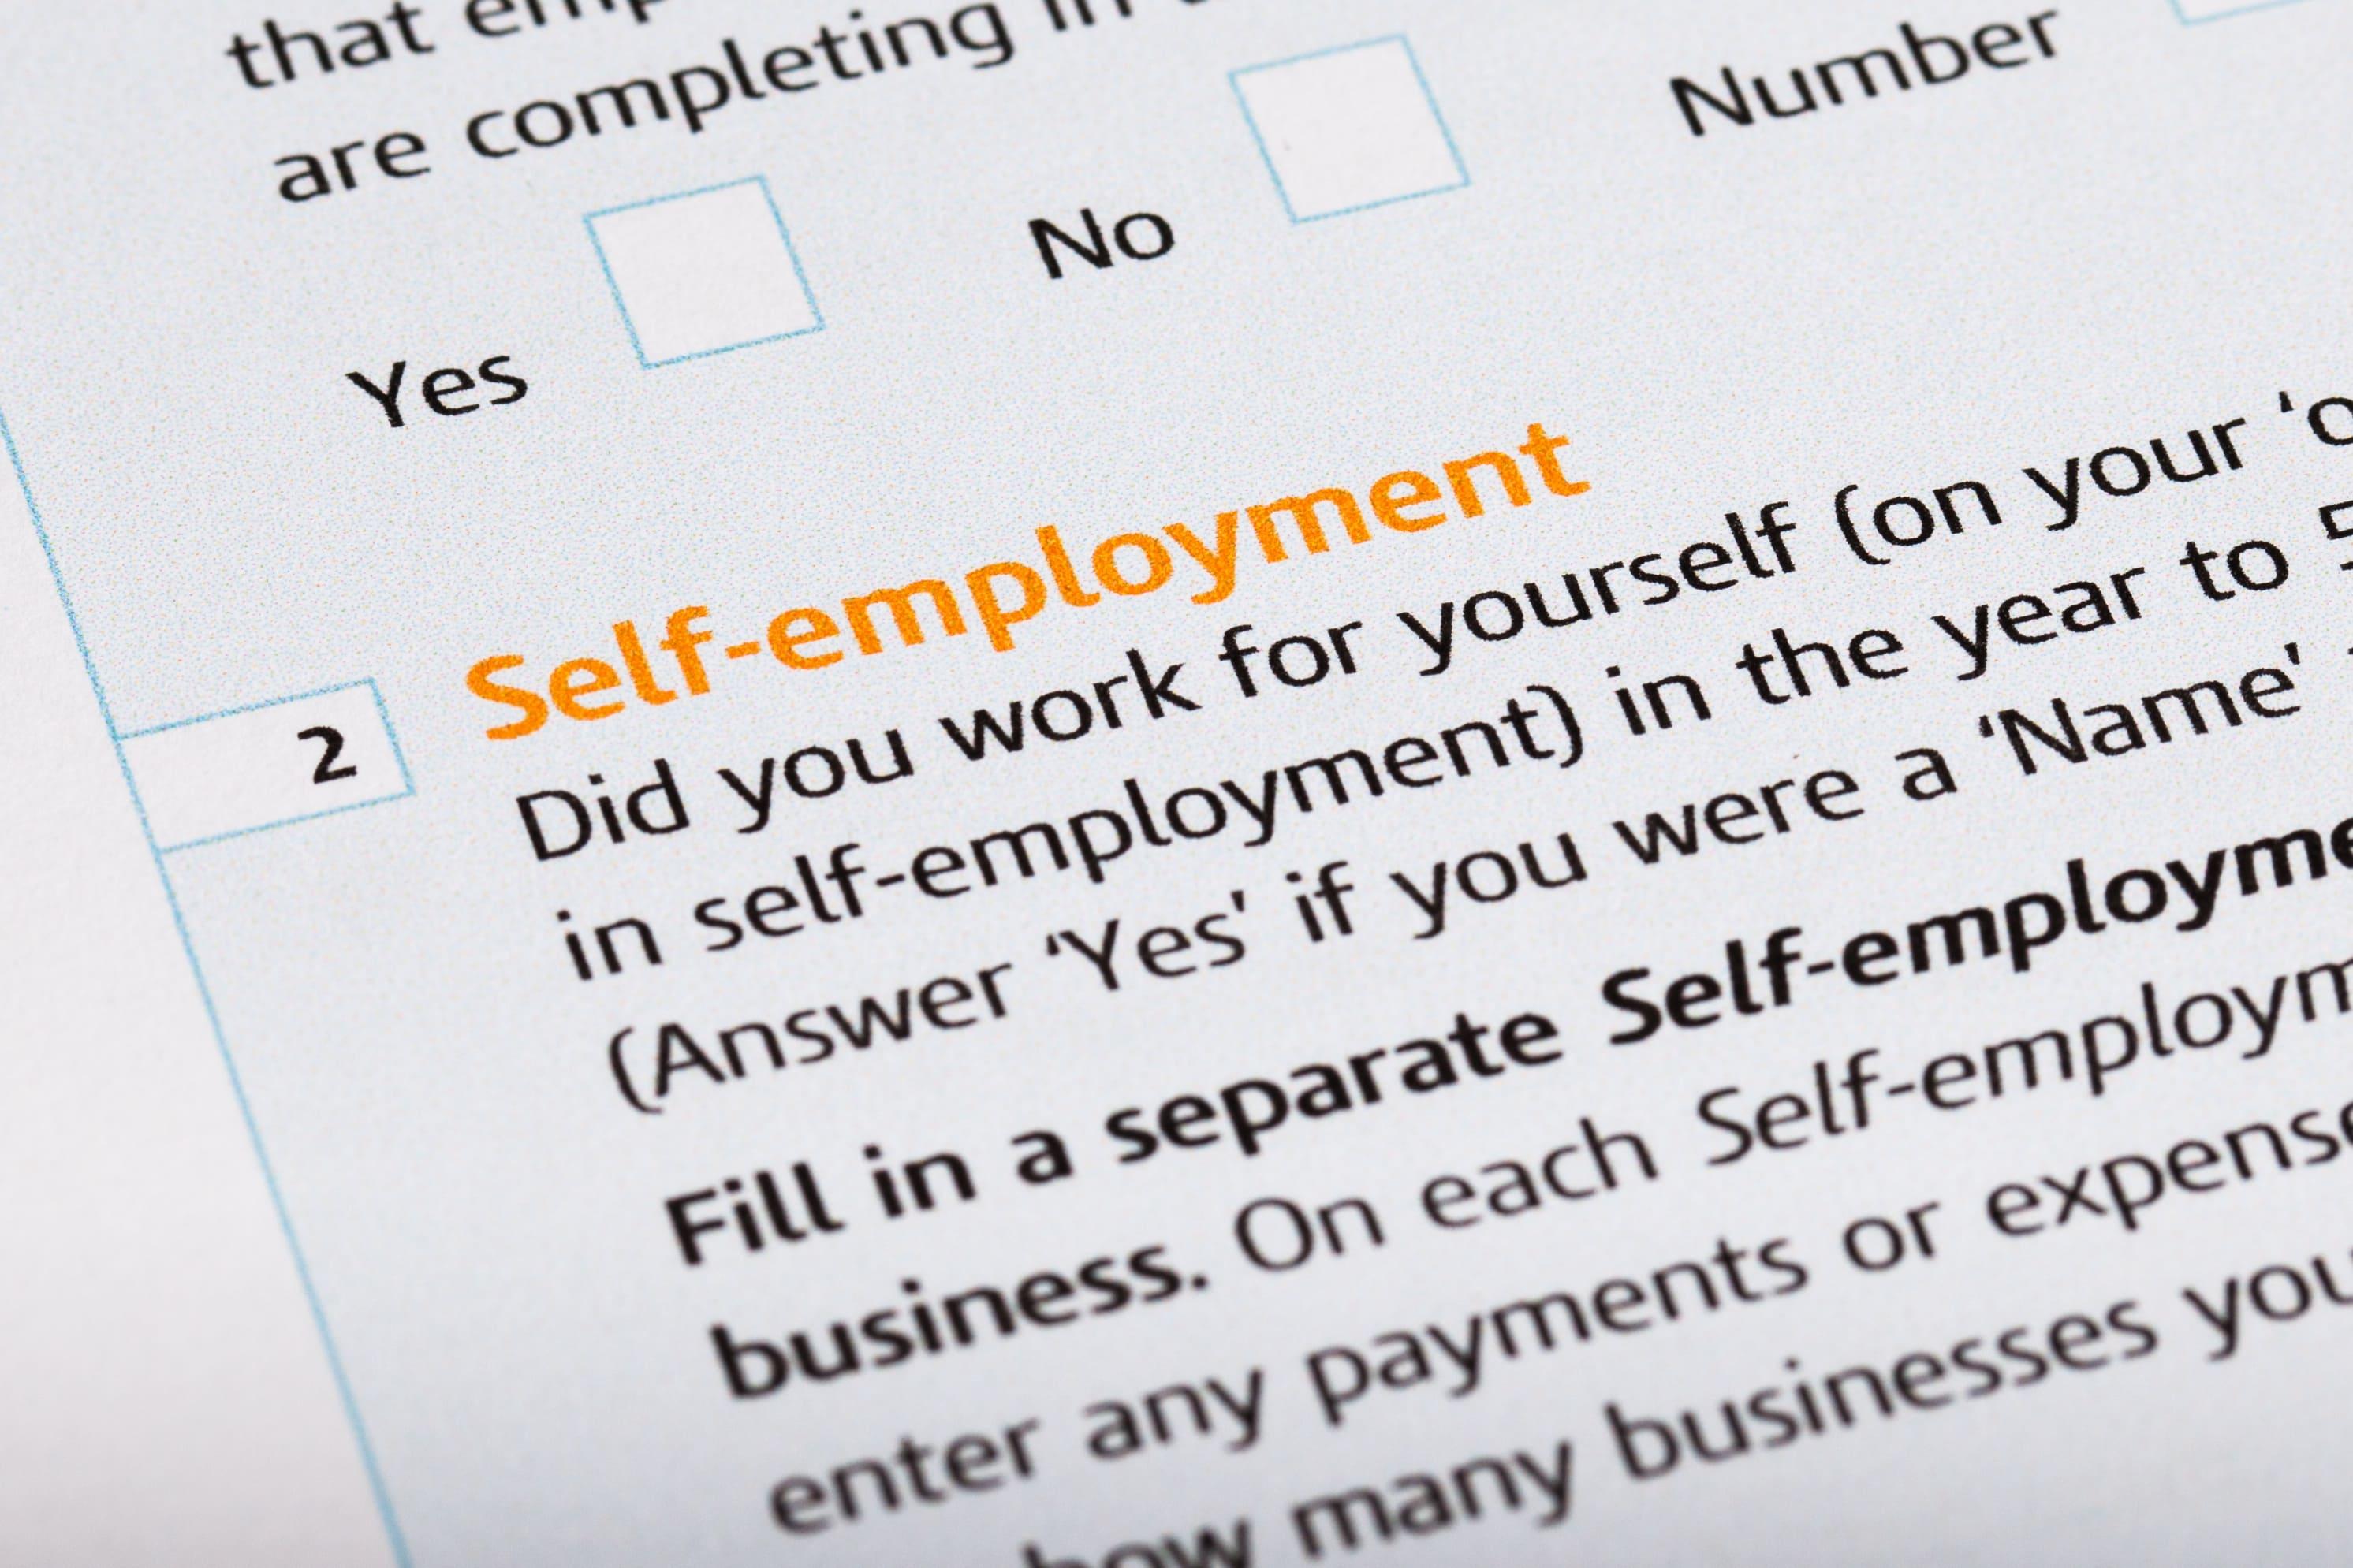 Self-employed form